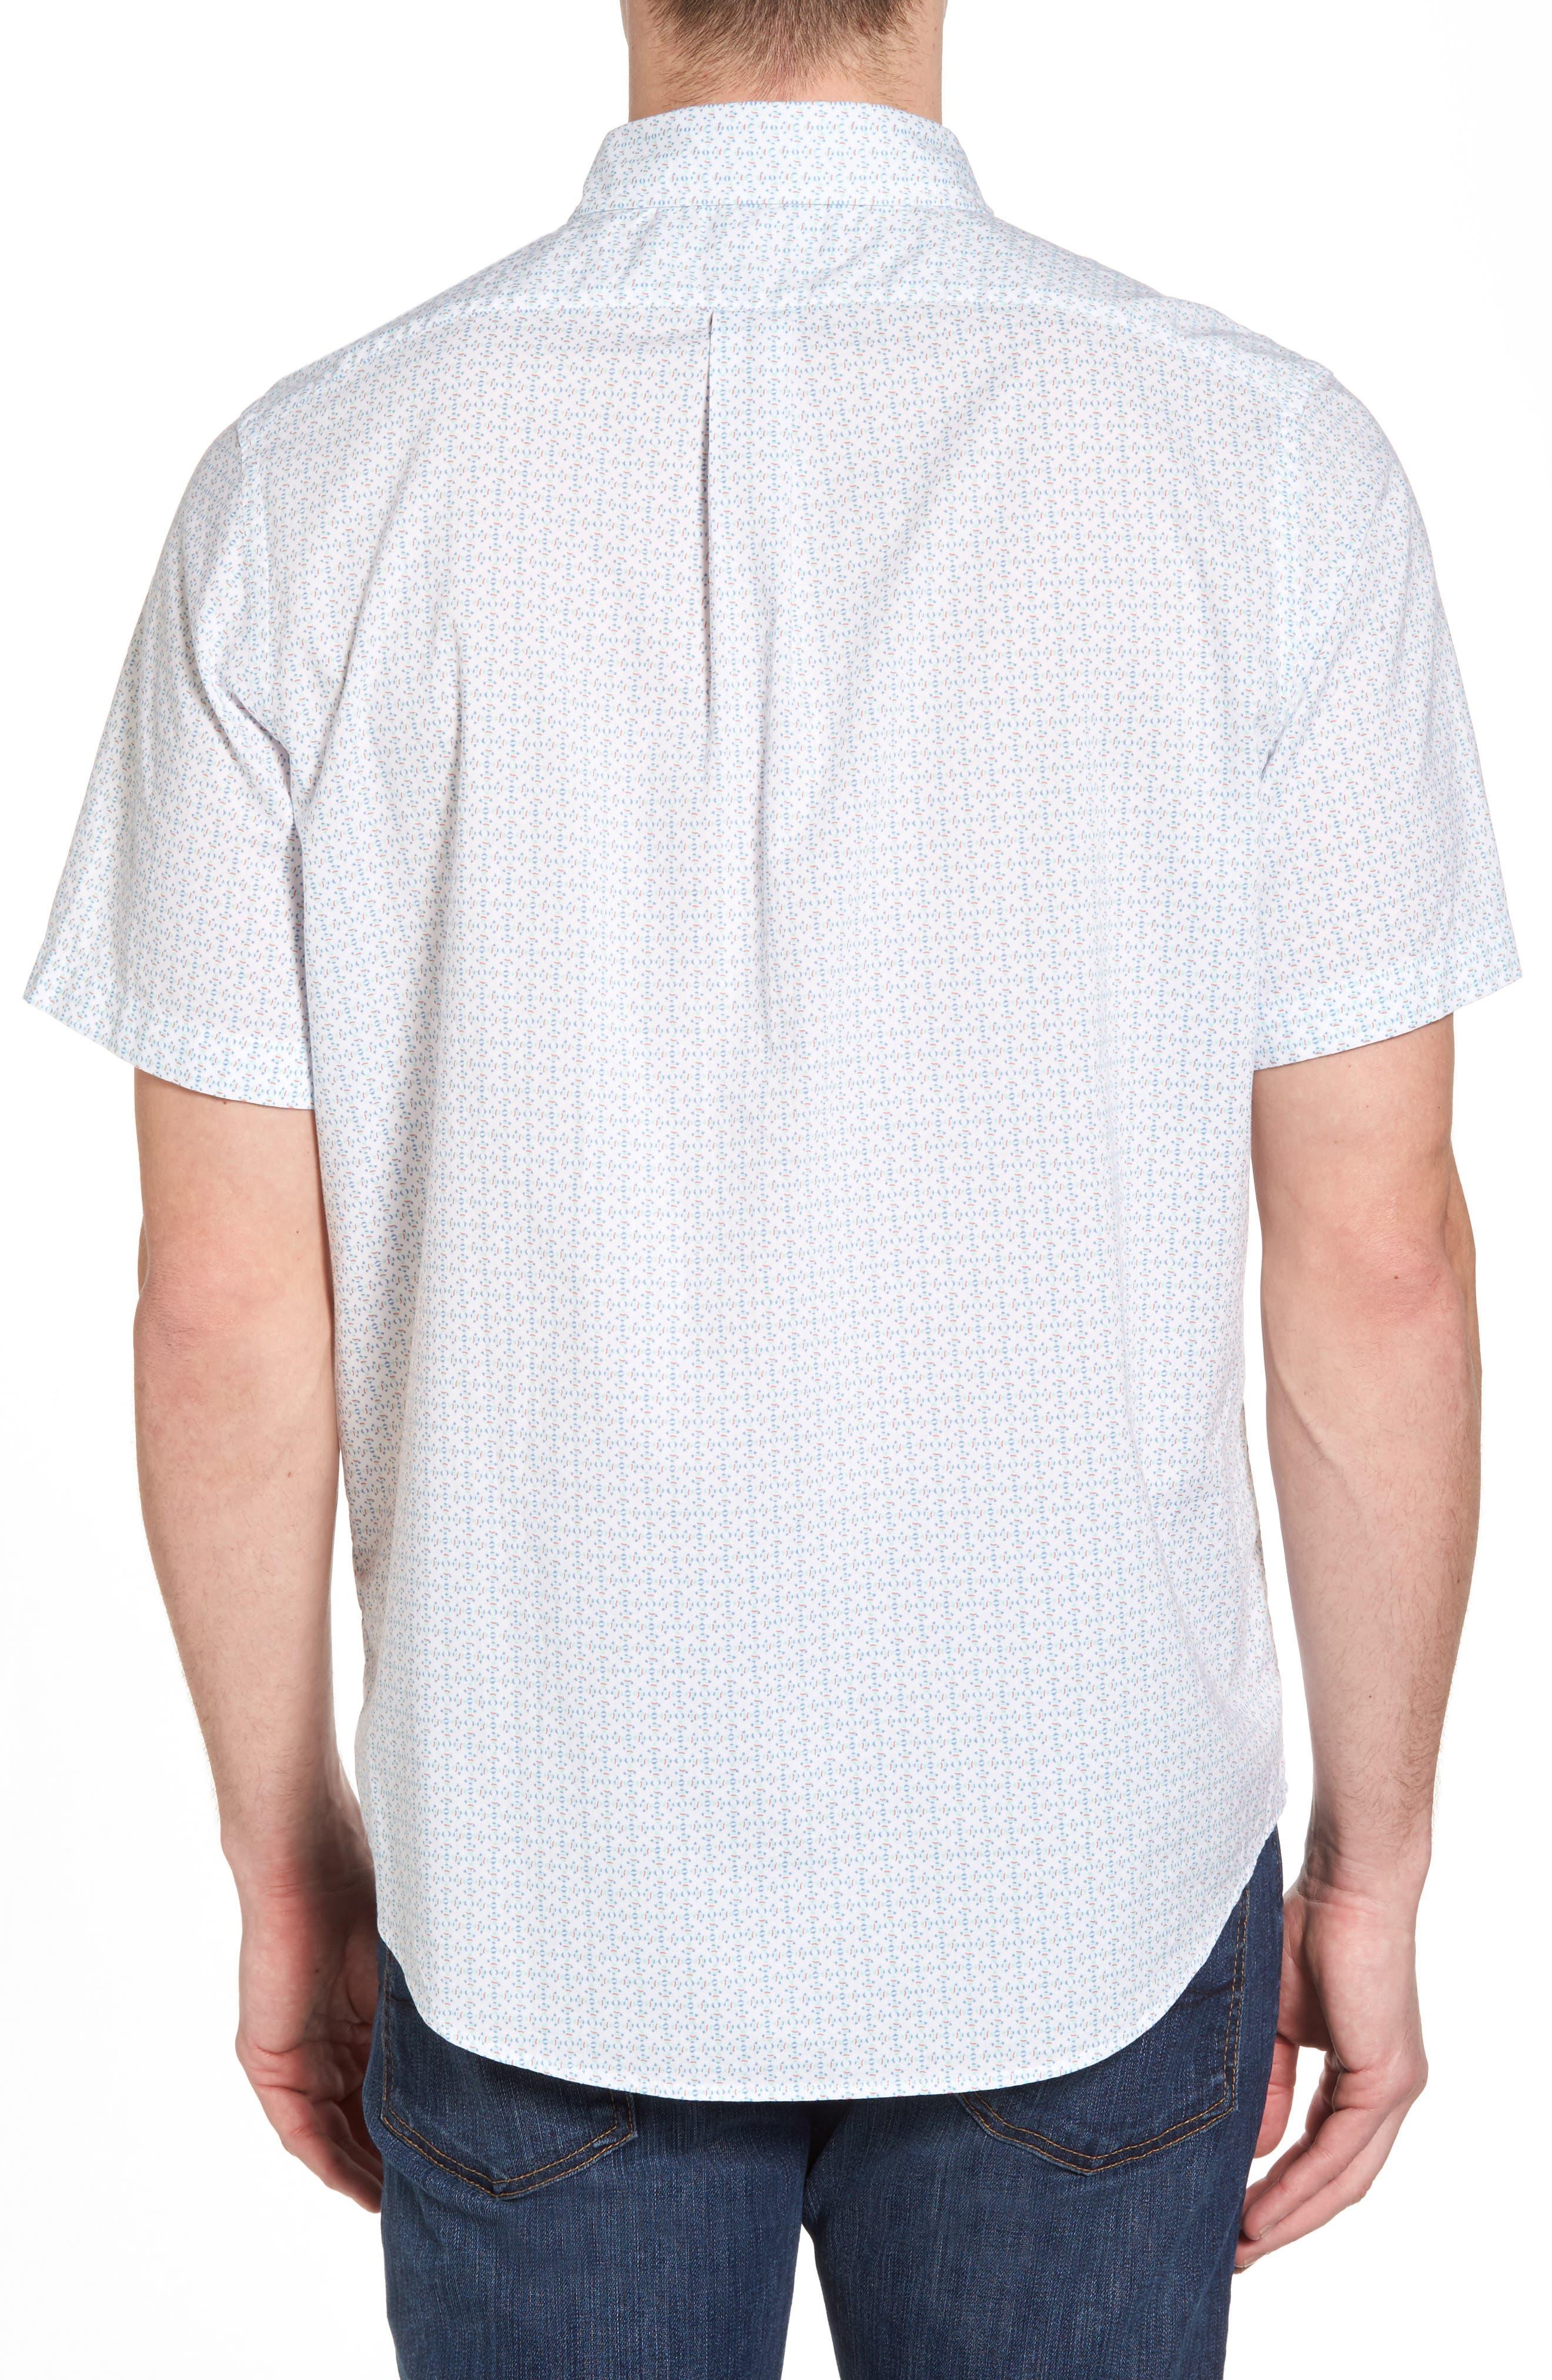 Fish Check Tucker Slim Fit Sport Shirt,                             Alternate thumbnail 2, color,                             100